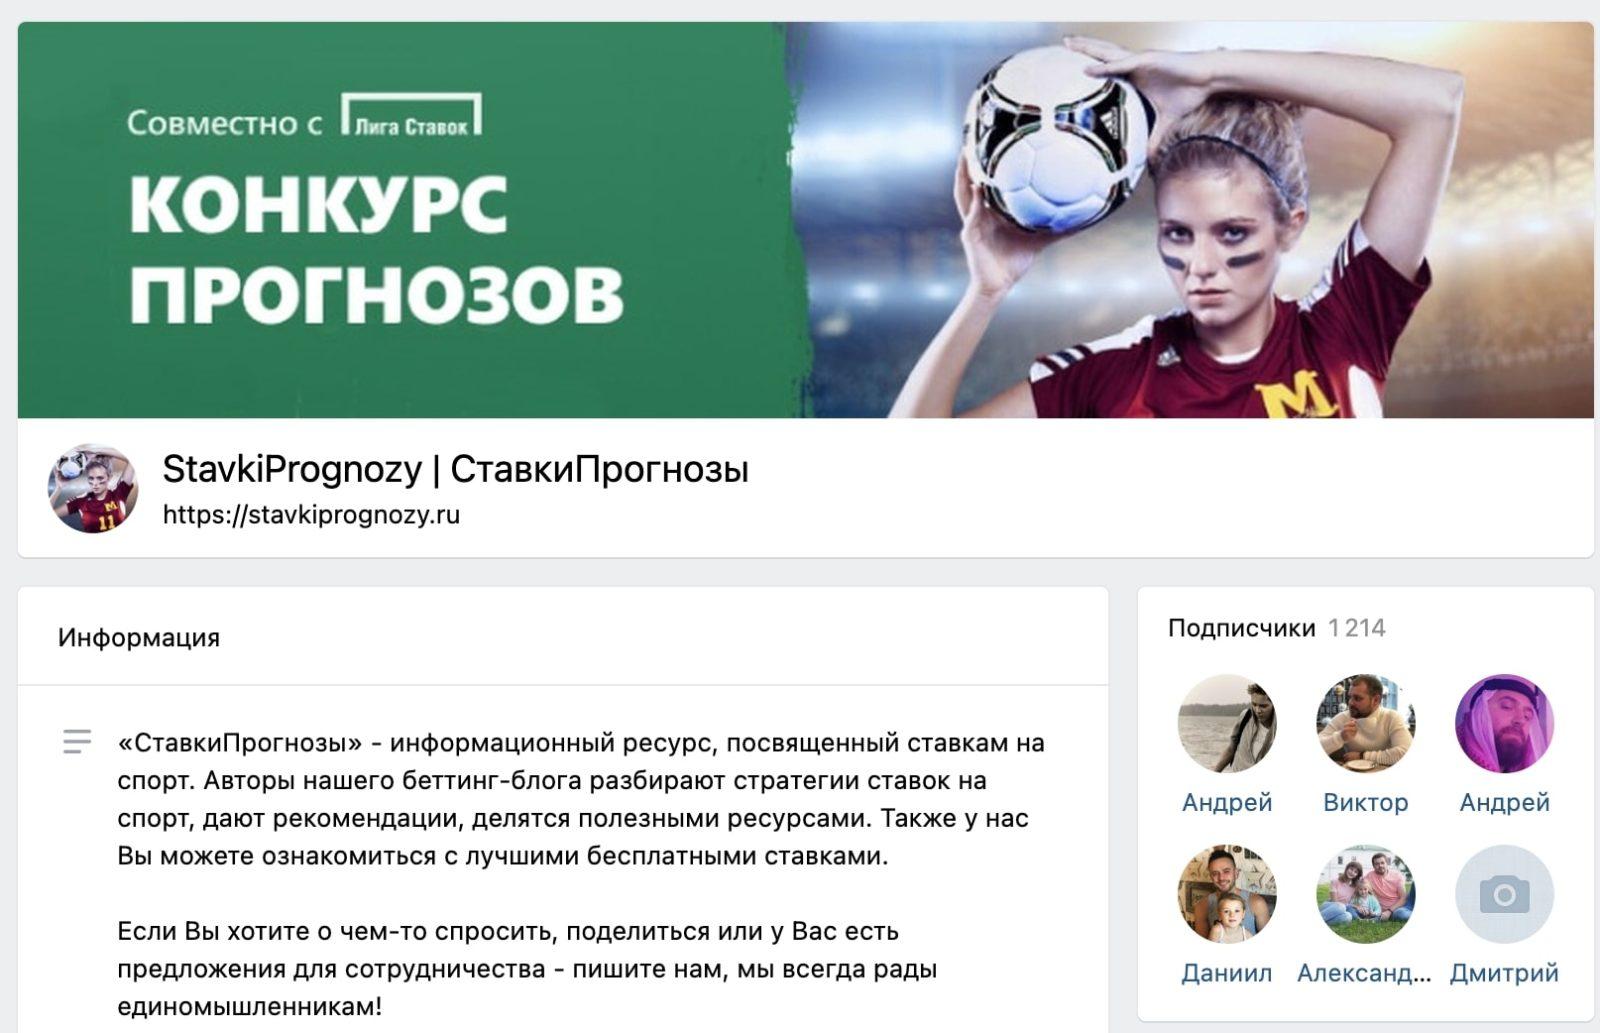 Группа ВК Stavkiprognozy.ru (Ставки прогнозы ру)